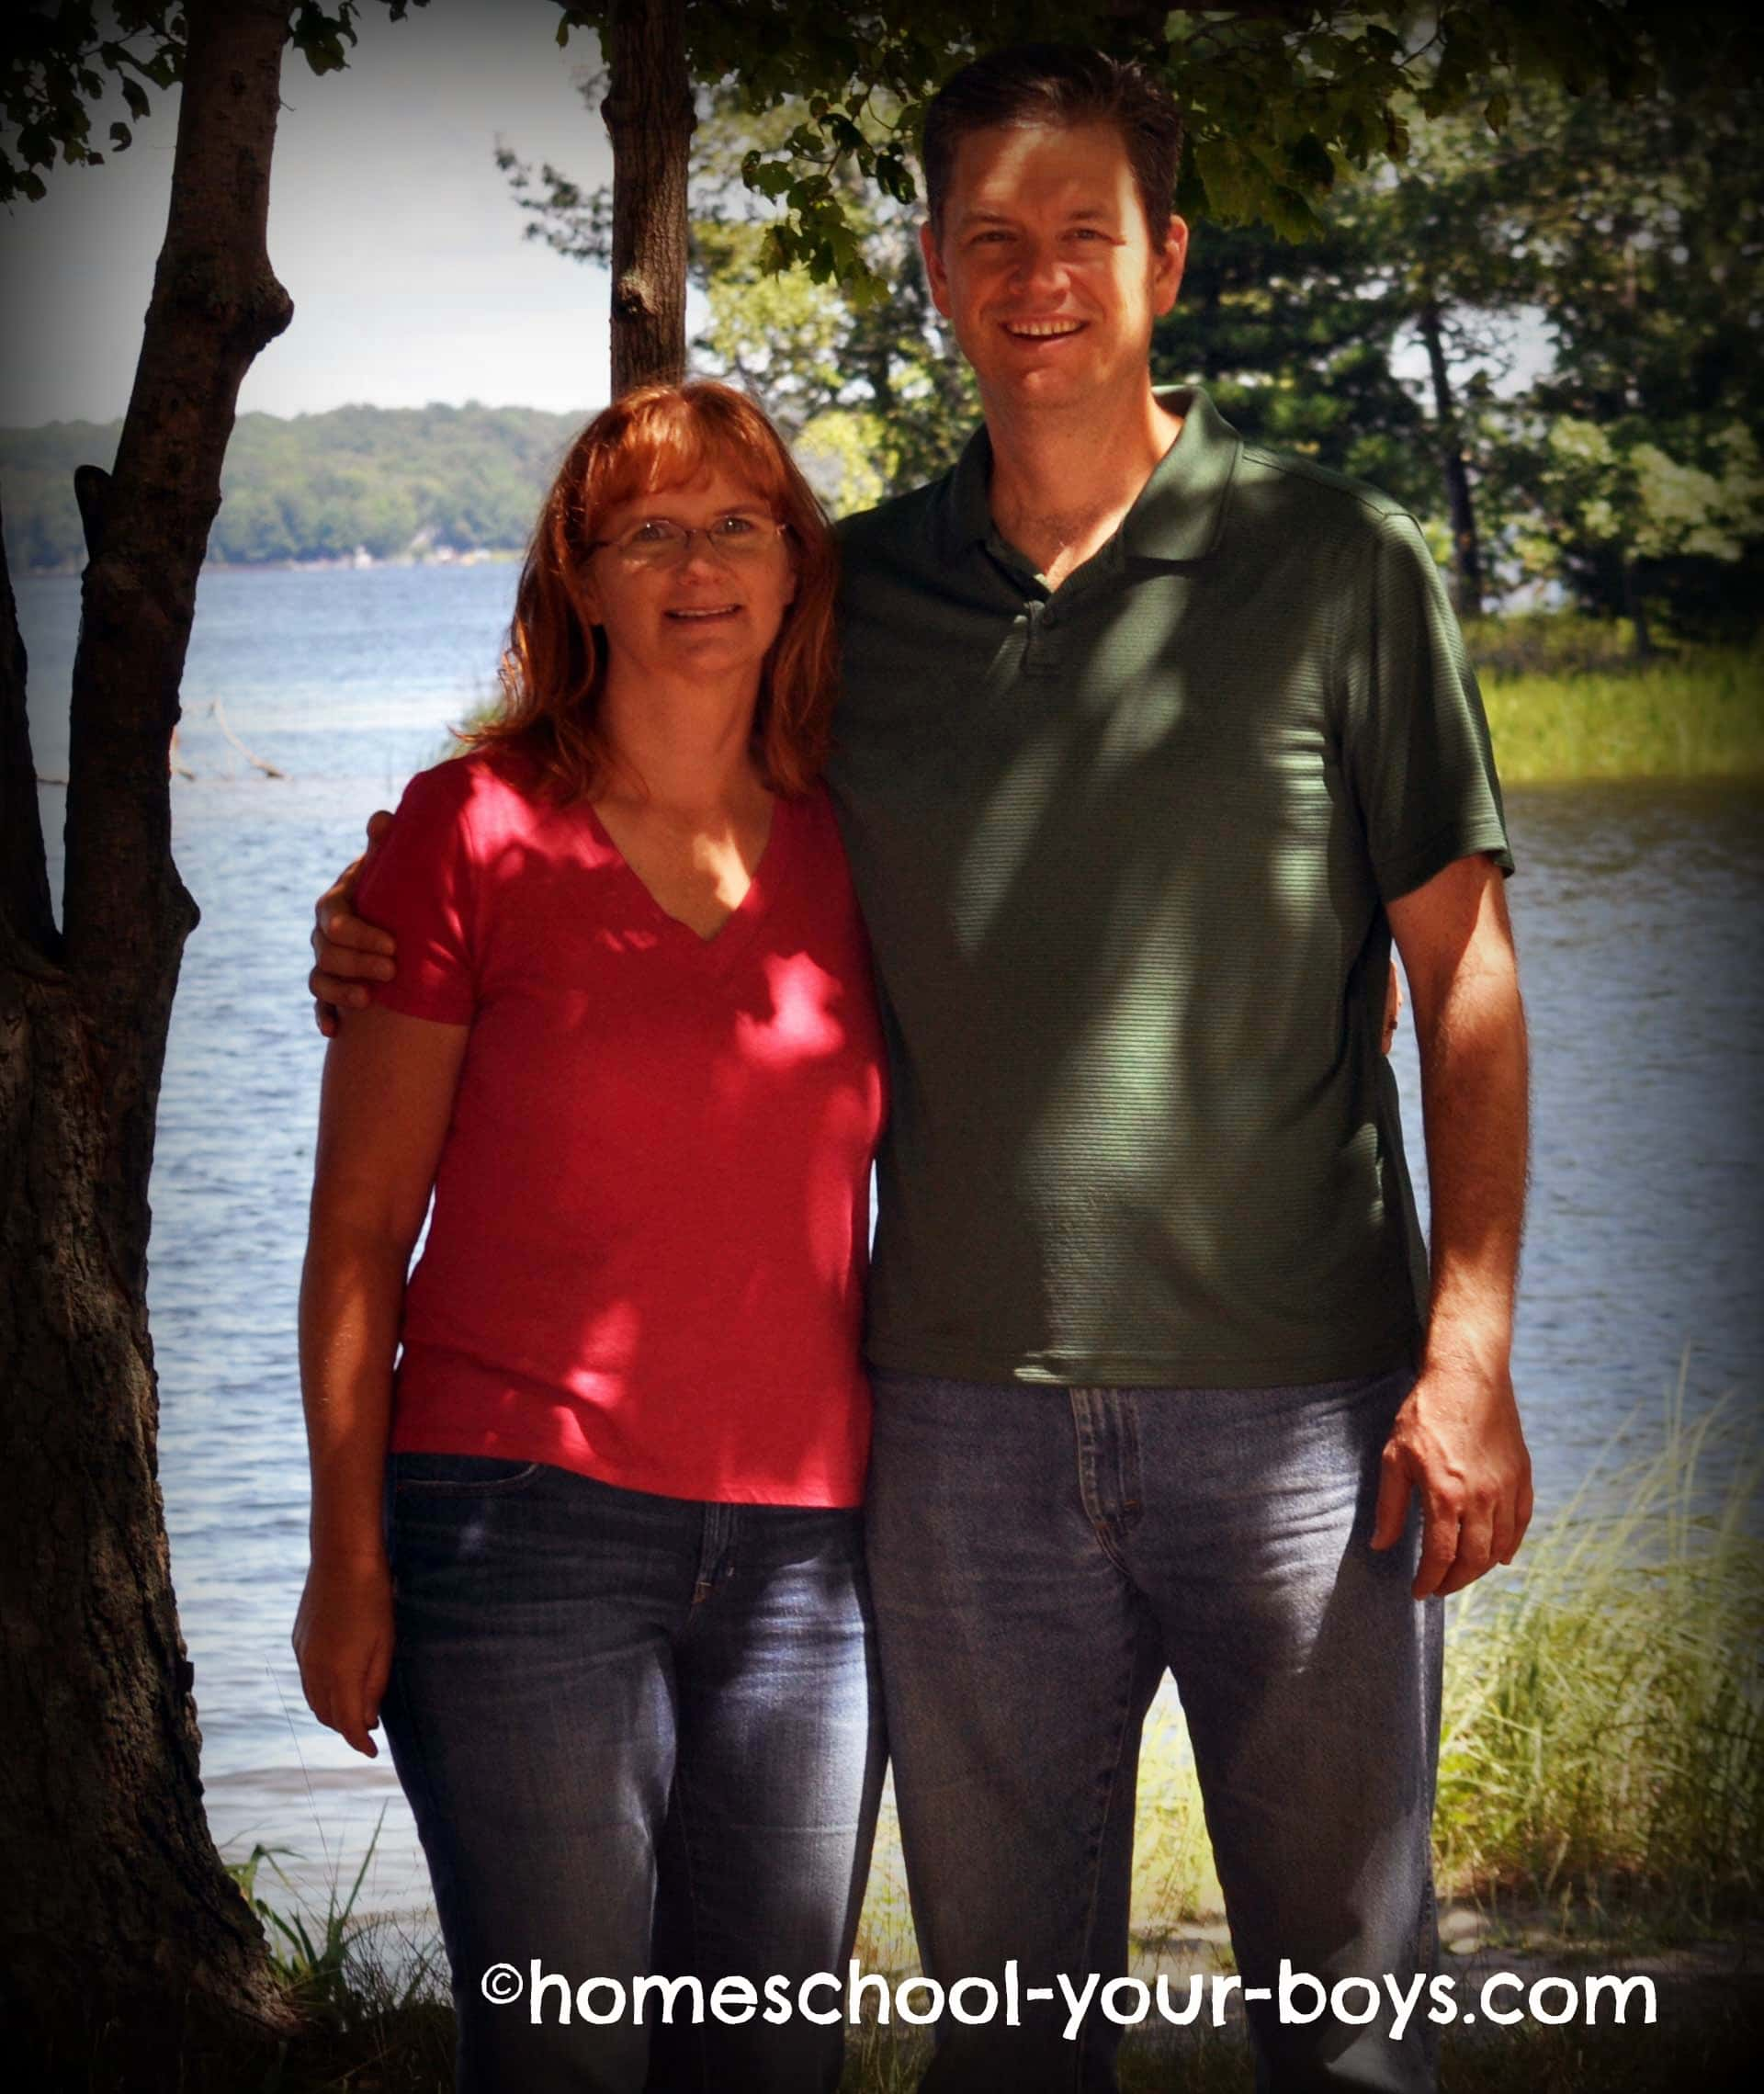 Dennis and Michelle Caskey